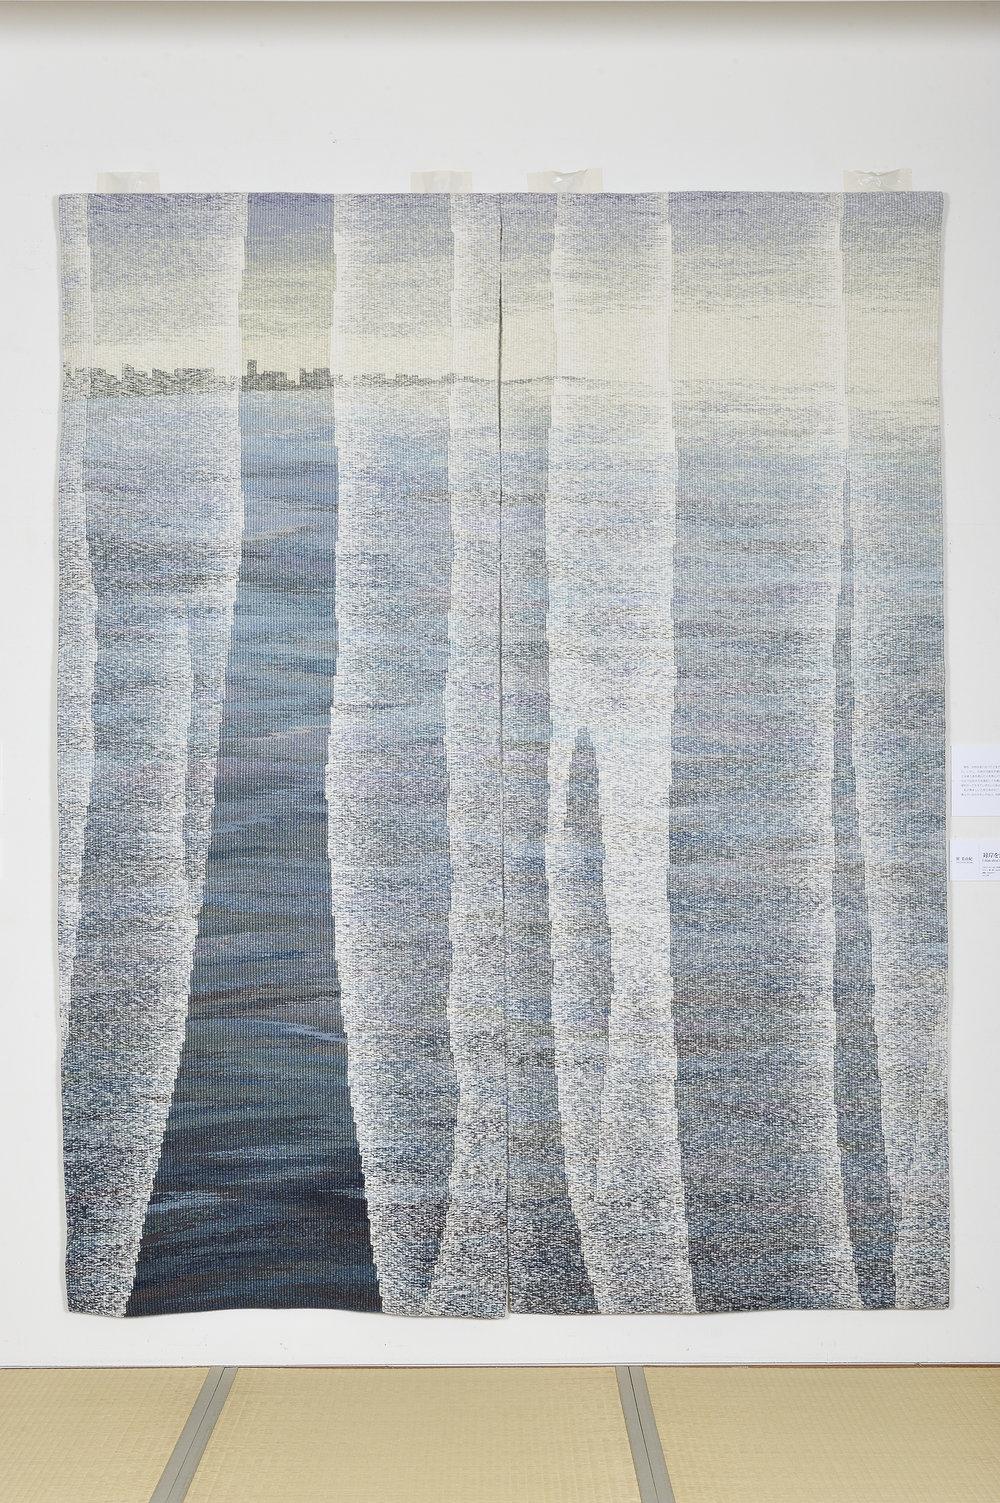 Miyuki Tatsumi - Reflection on the other side